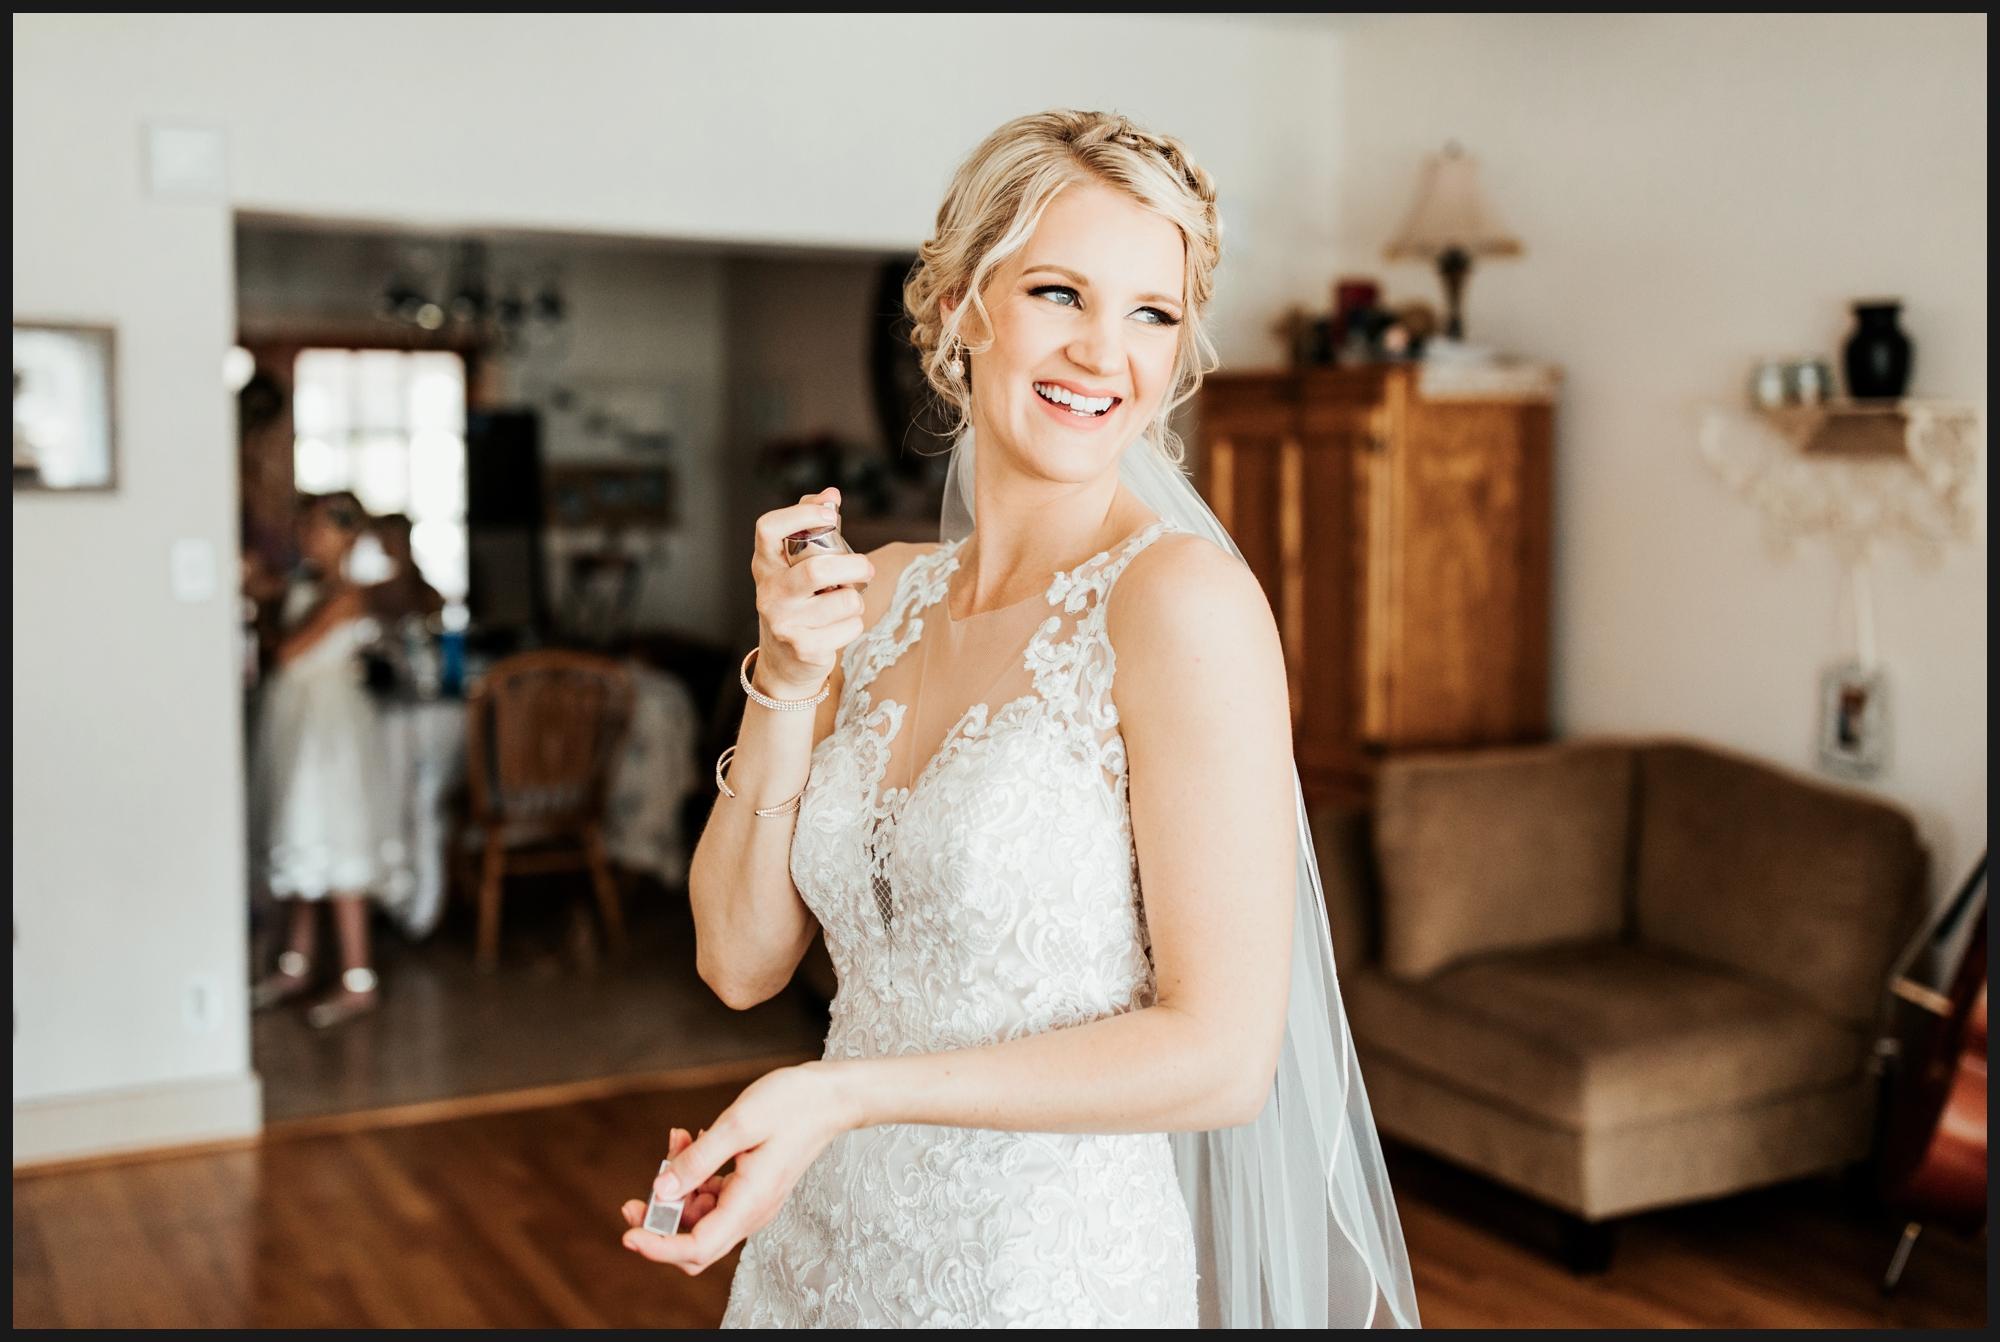 Orlando-Wedding-Photographer-destination-wedding-photographer-florida-wedding-photographer-hawaii-wedding-photographer_0565.jpg